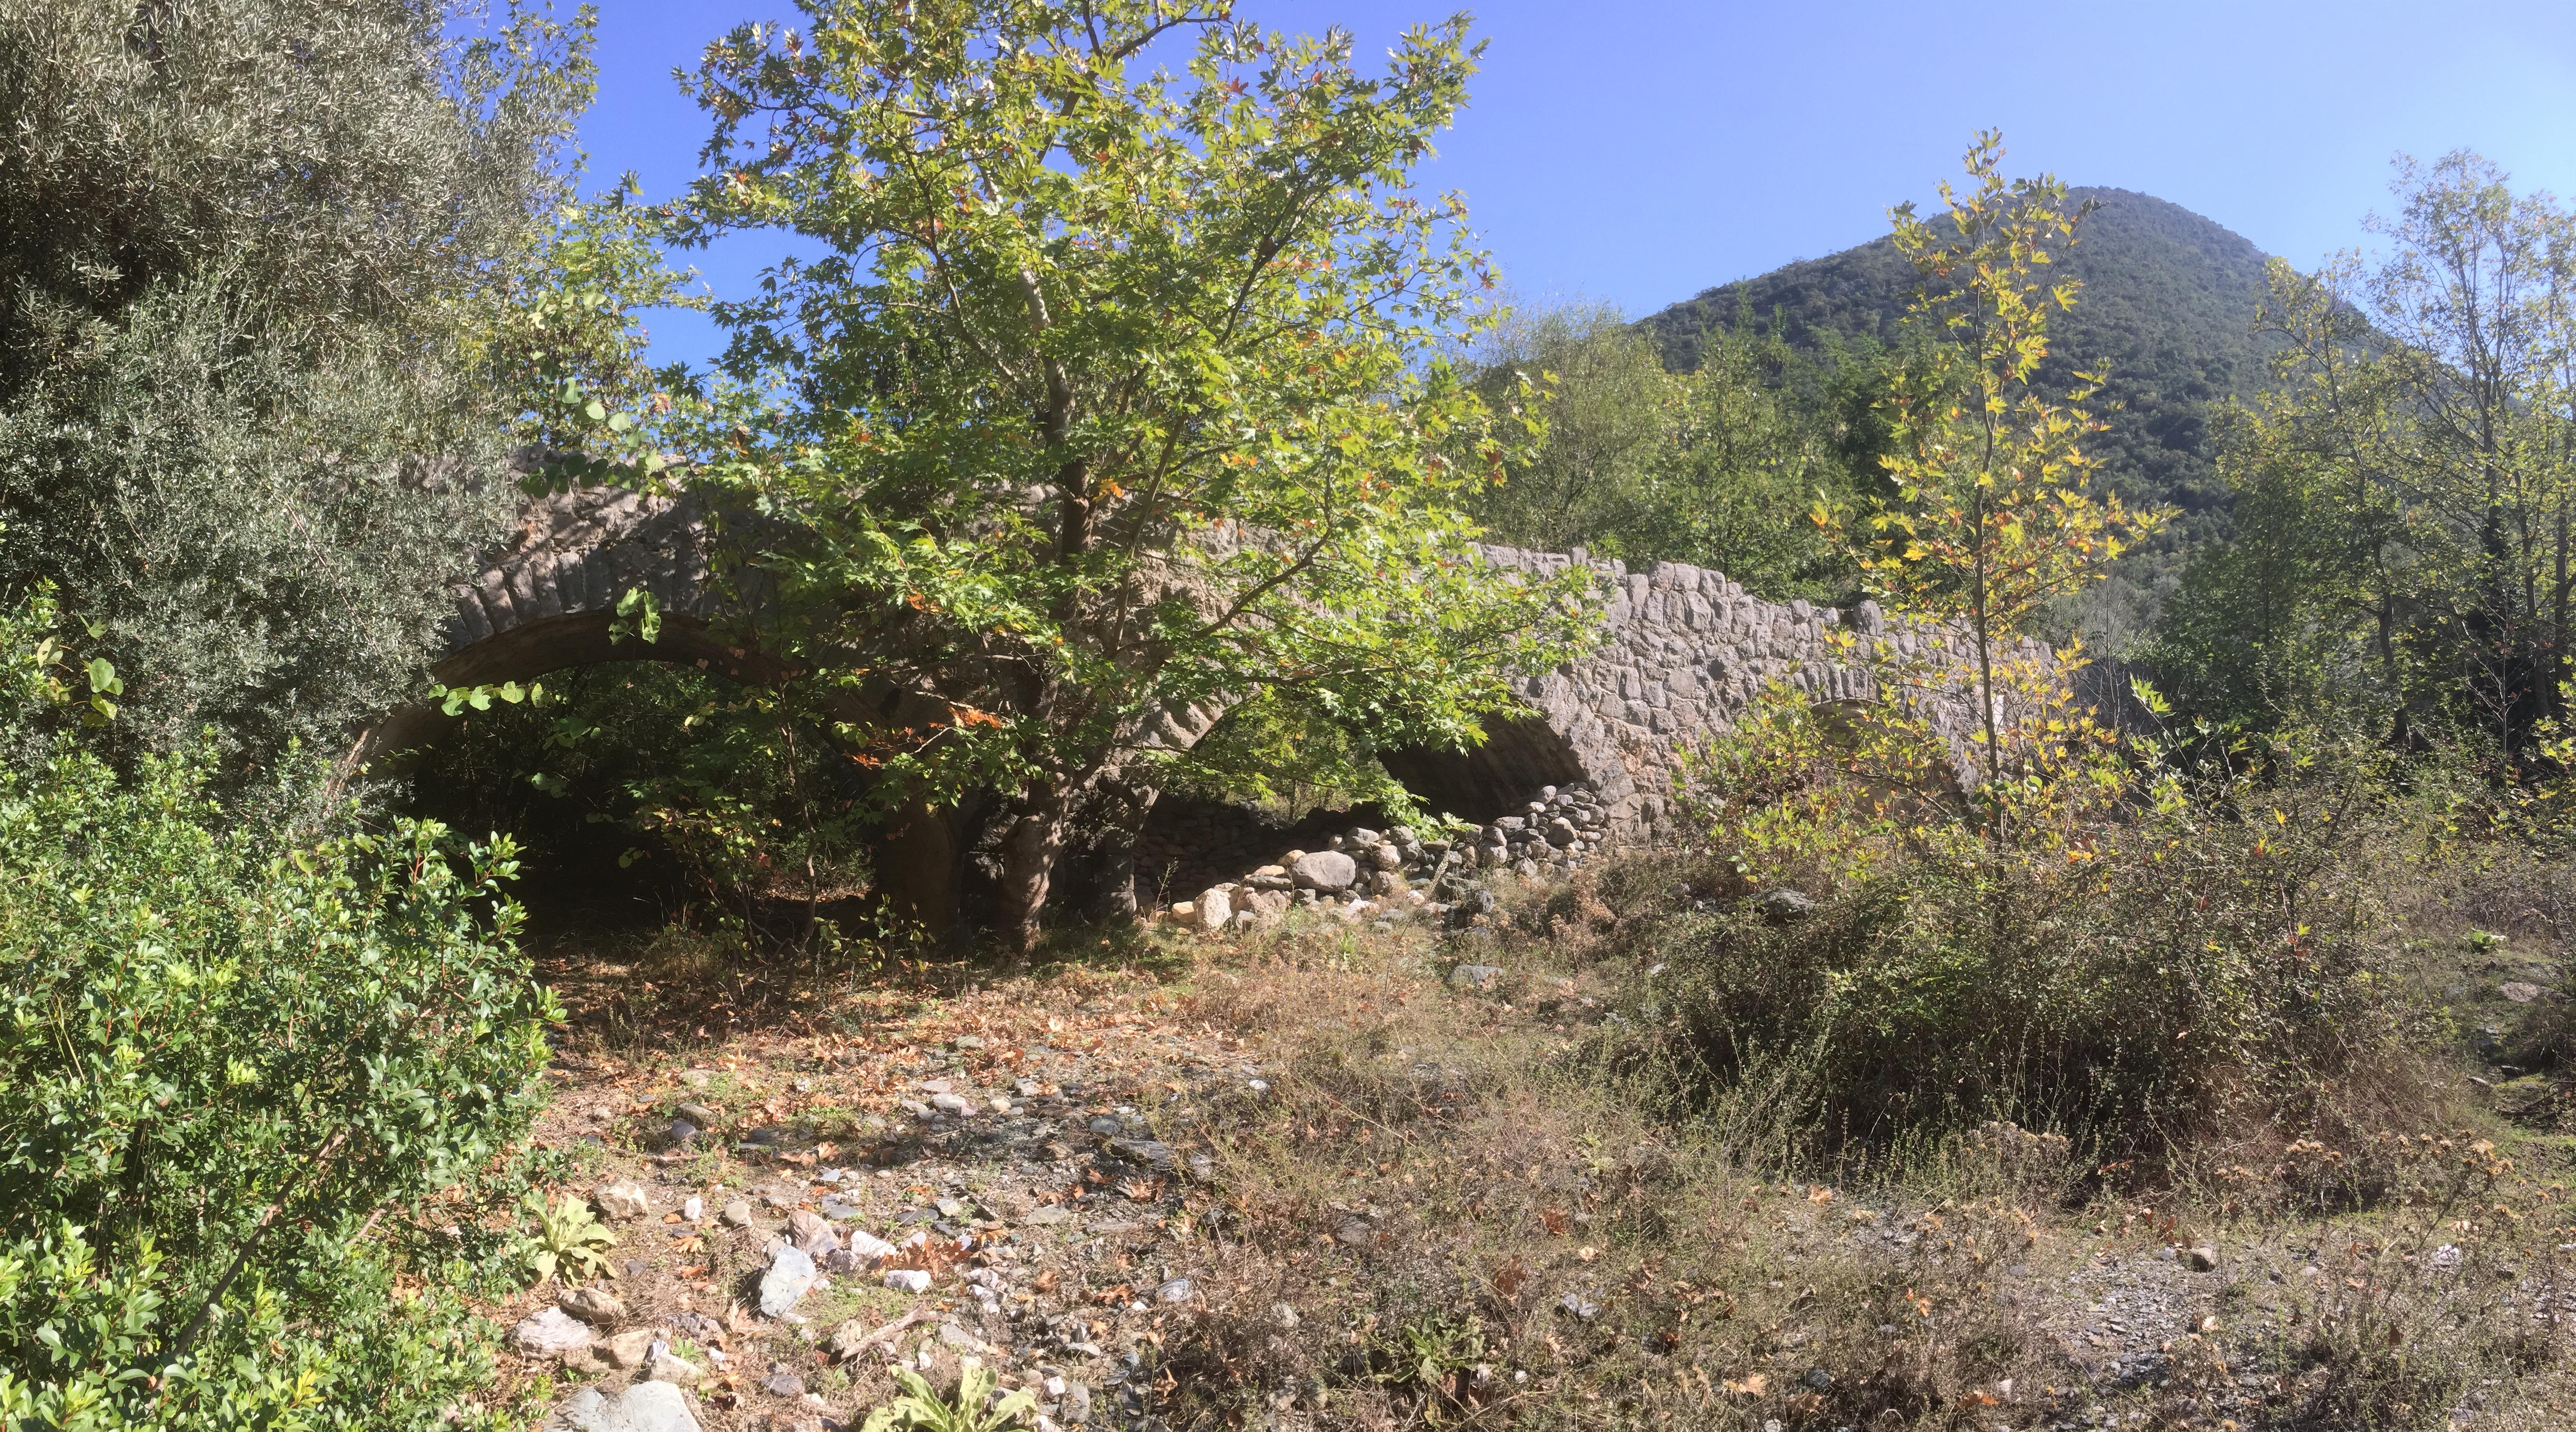 Brücke Ag. Polikarpos über den oberen Nedontas im Taygetosgebirge oberhalb von Kalamata